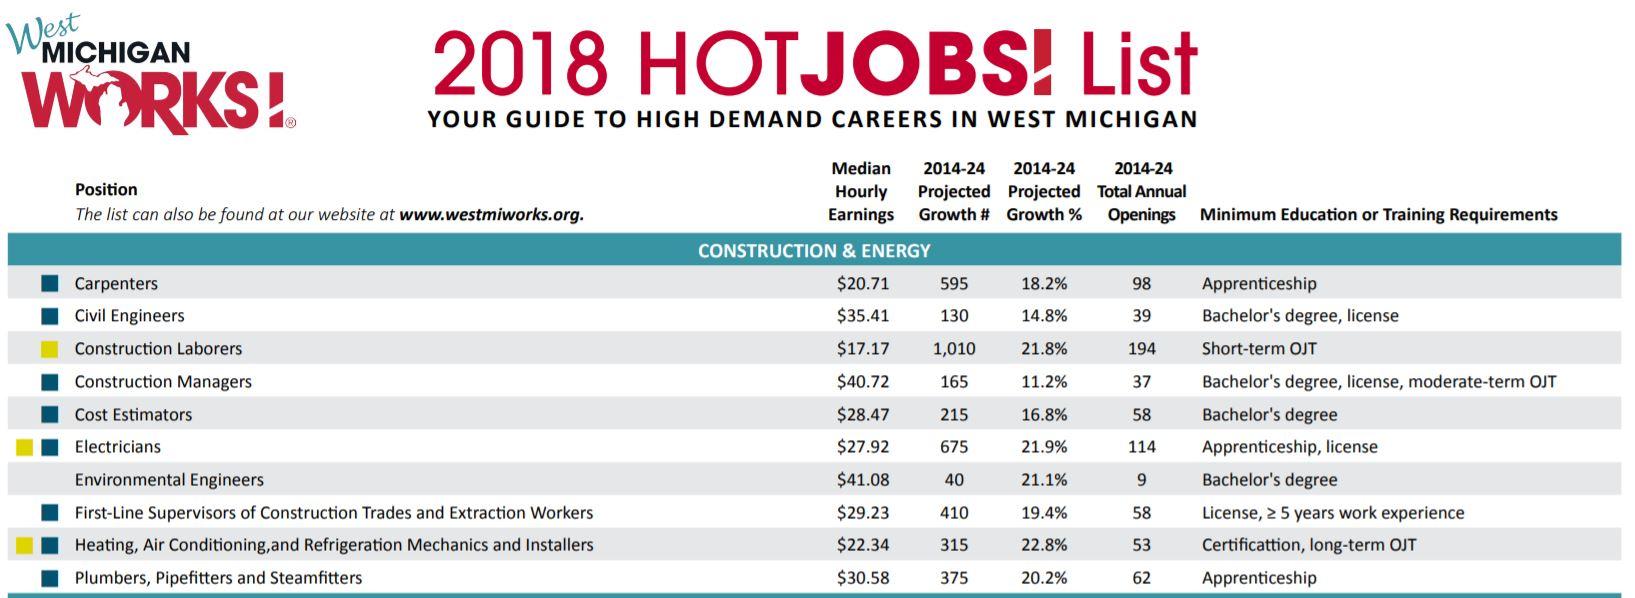 Mich Works Hot Jobs.JPG